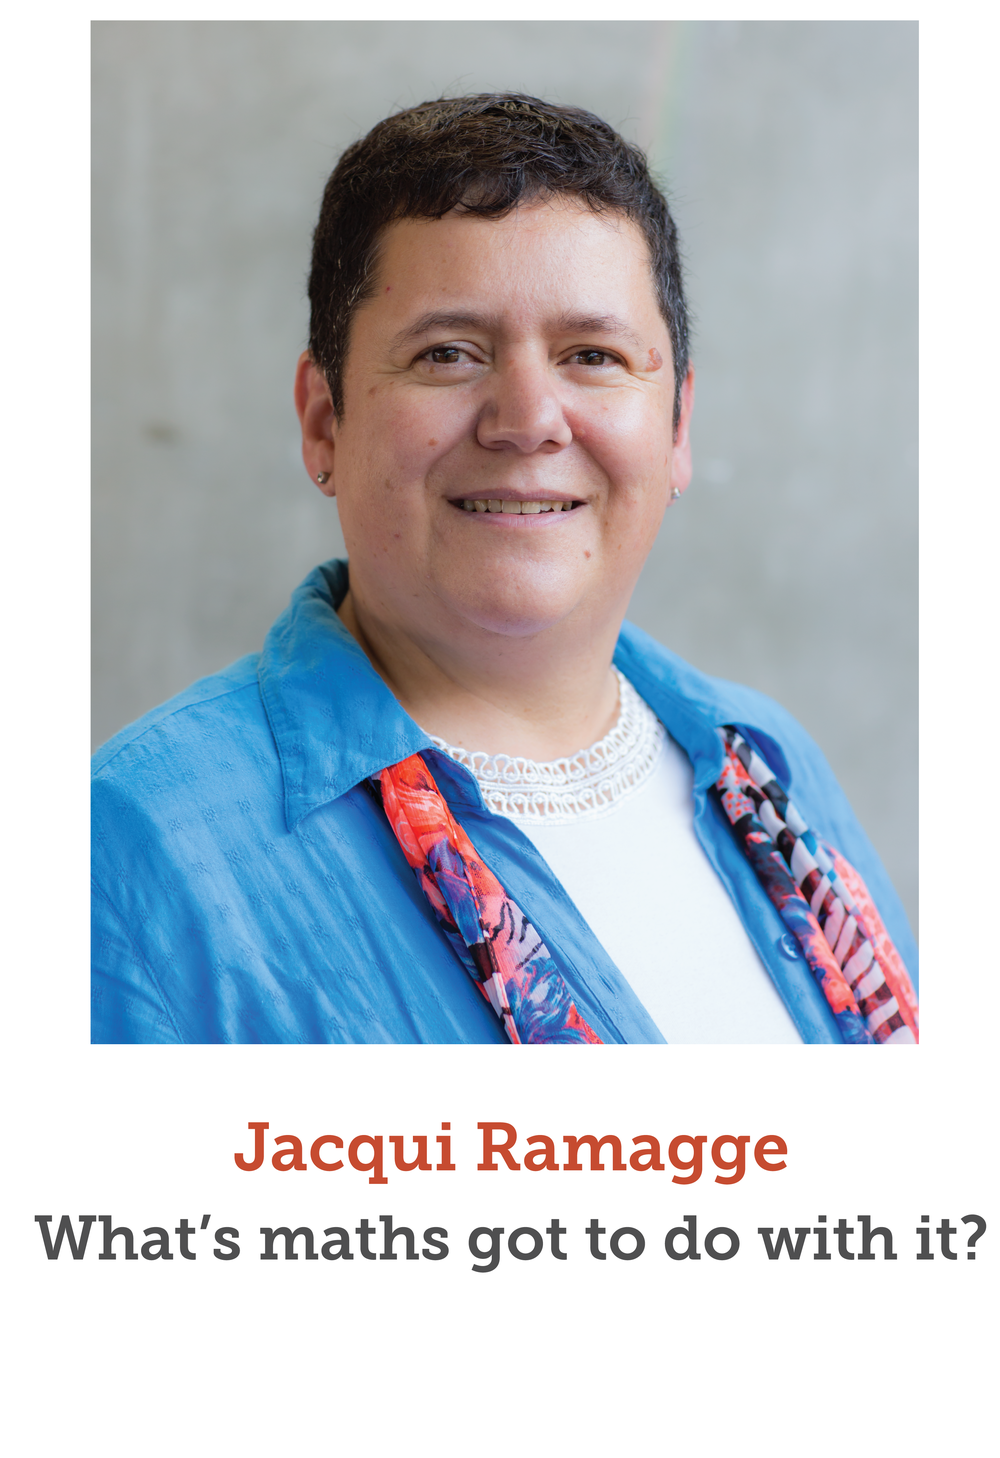 Jacqui-R!-01.png